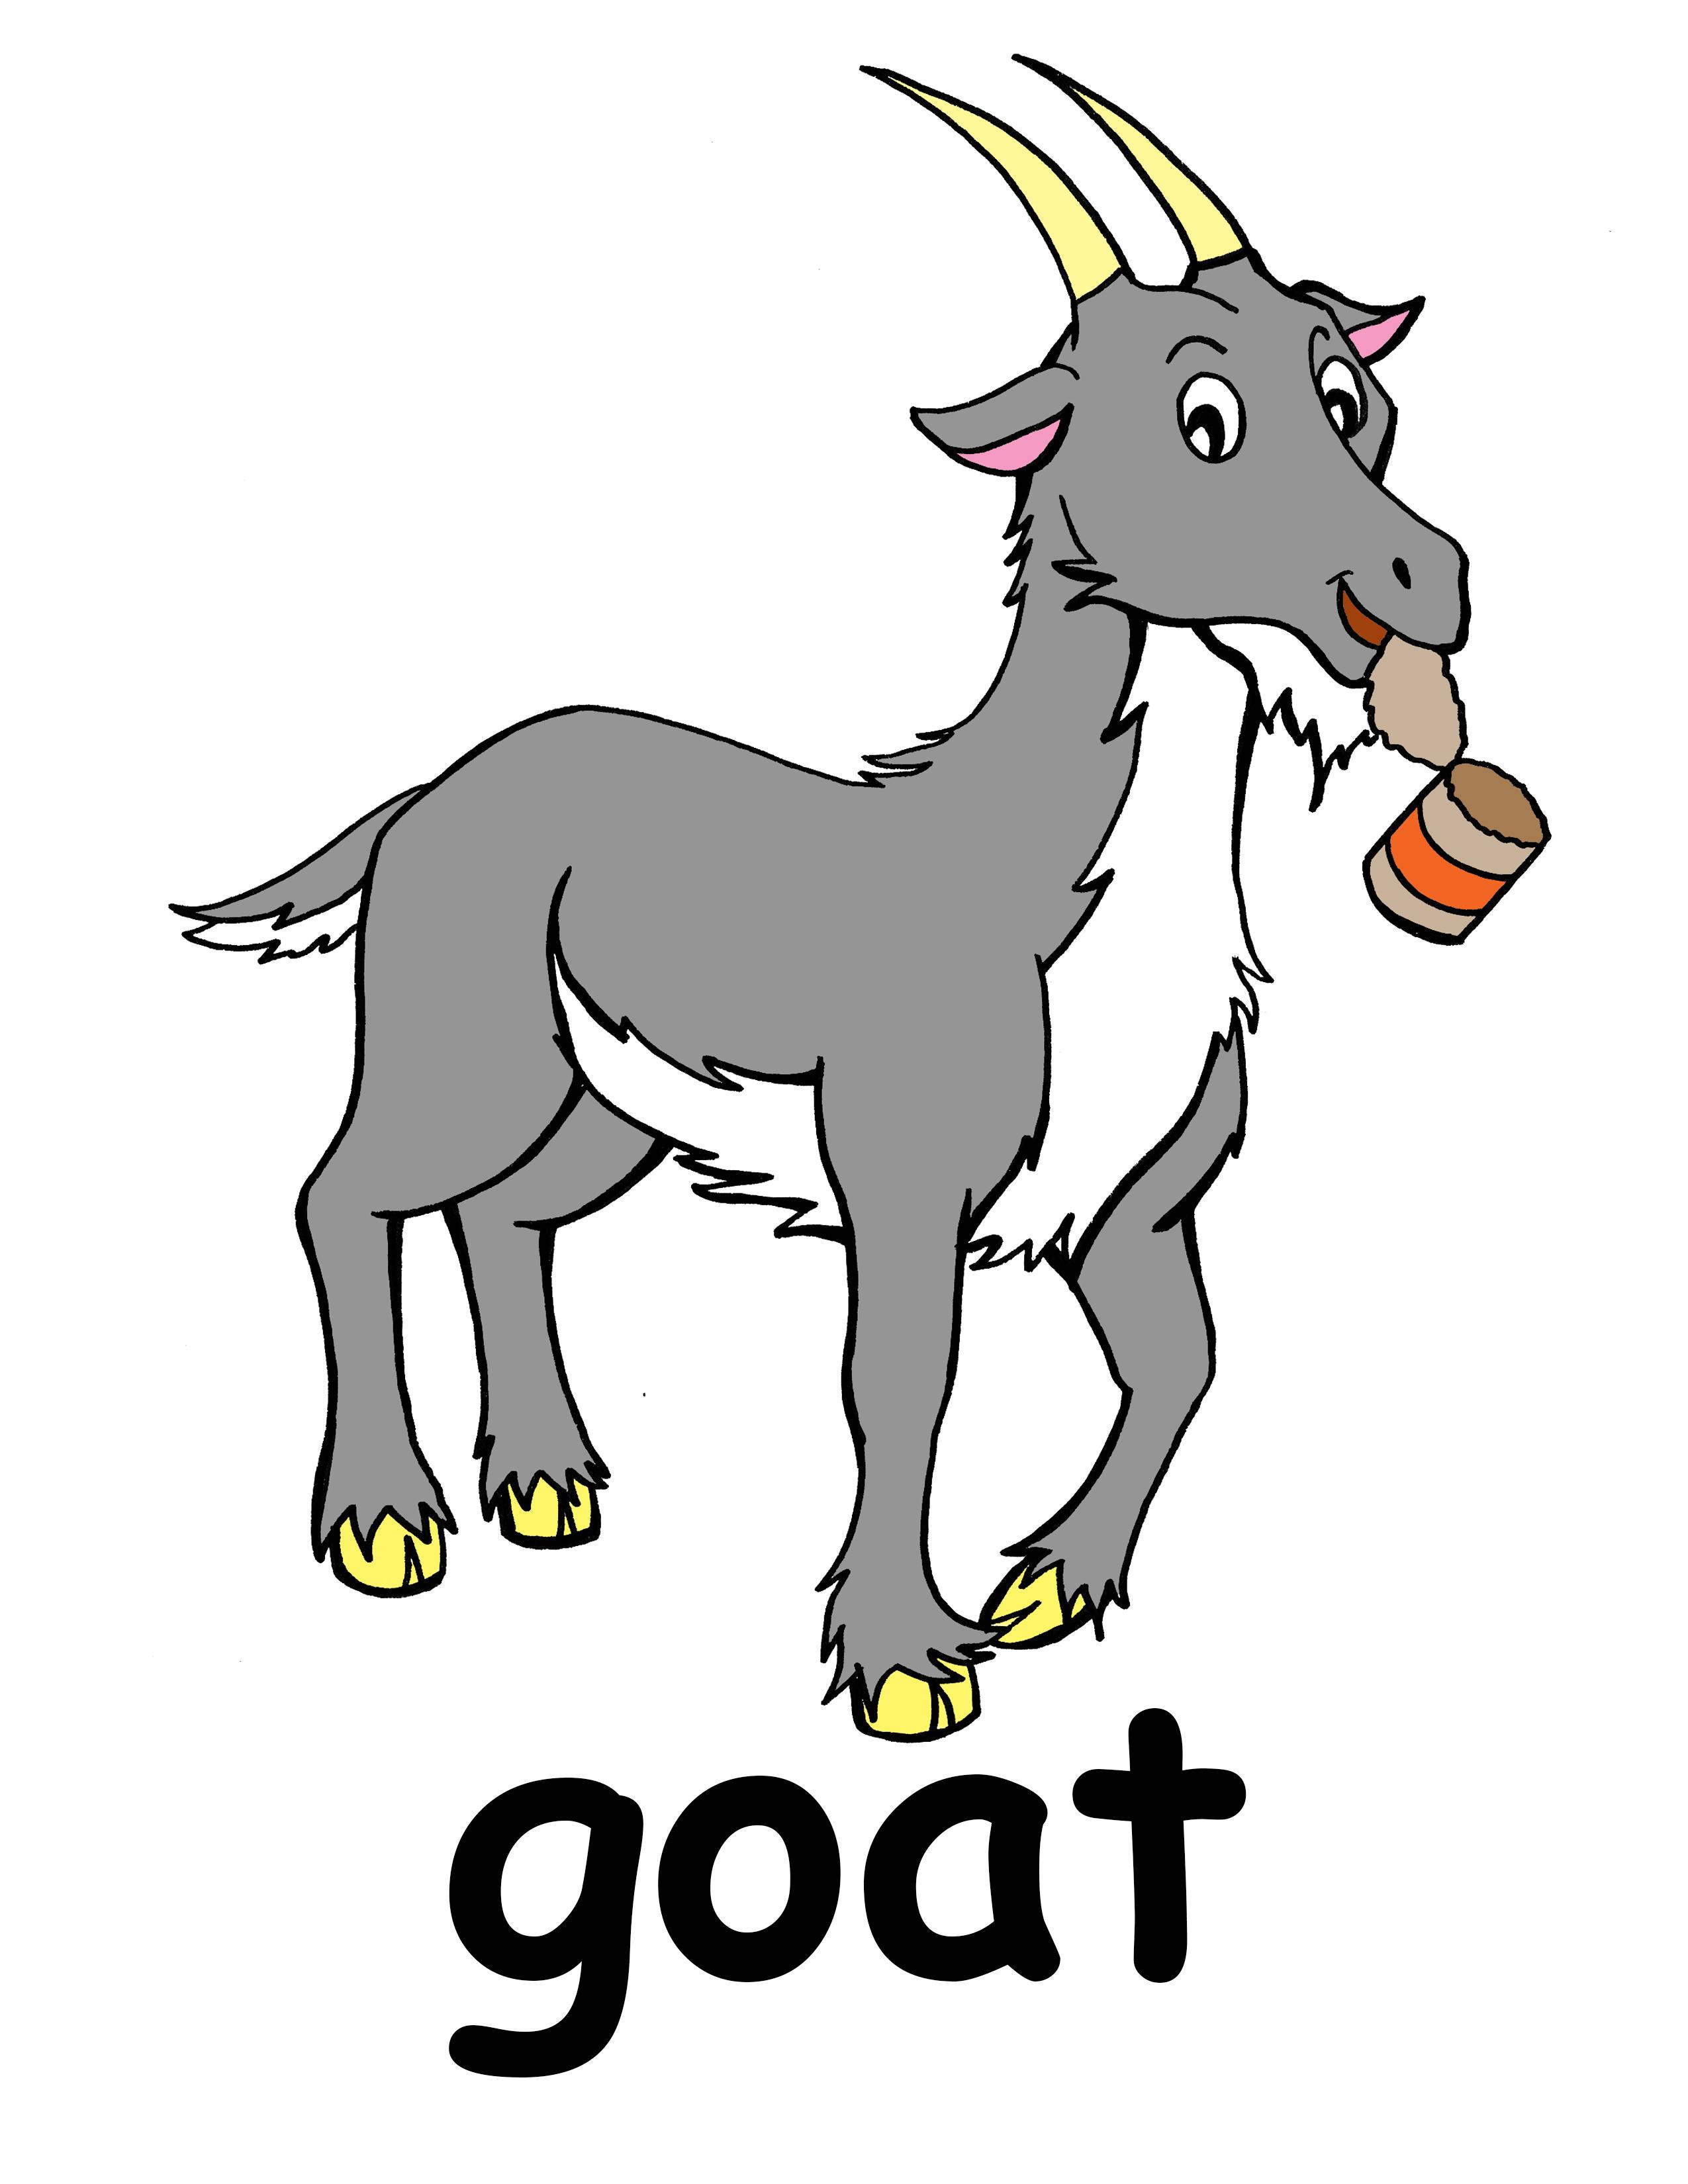 Goat Clip Art Cartoon Goat Clip Art Mountain Goat Clip Art Goat